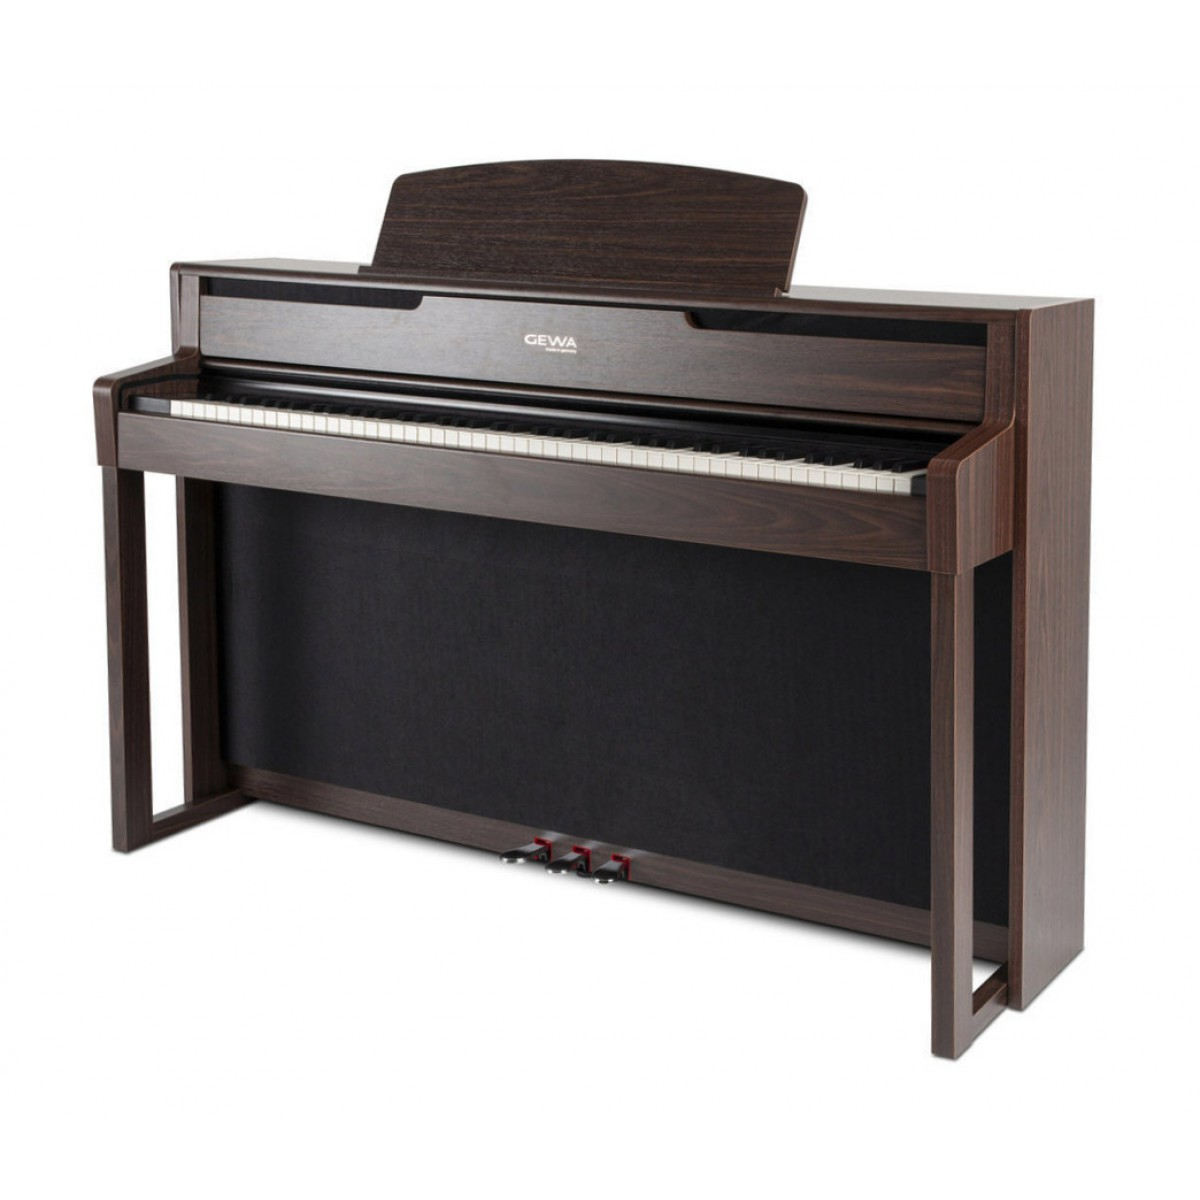 GEWA E-Piano UP 400 Rosenholz